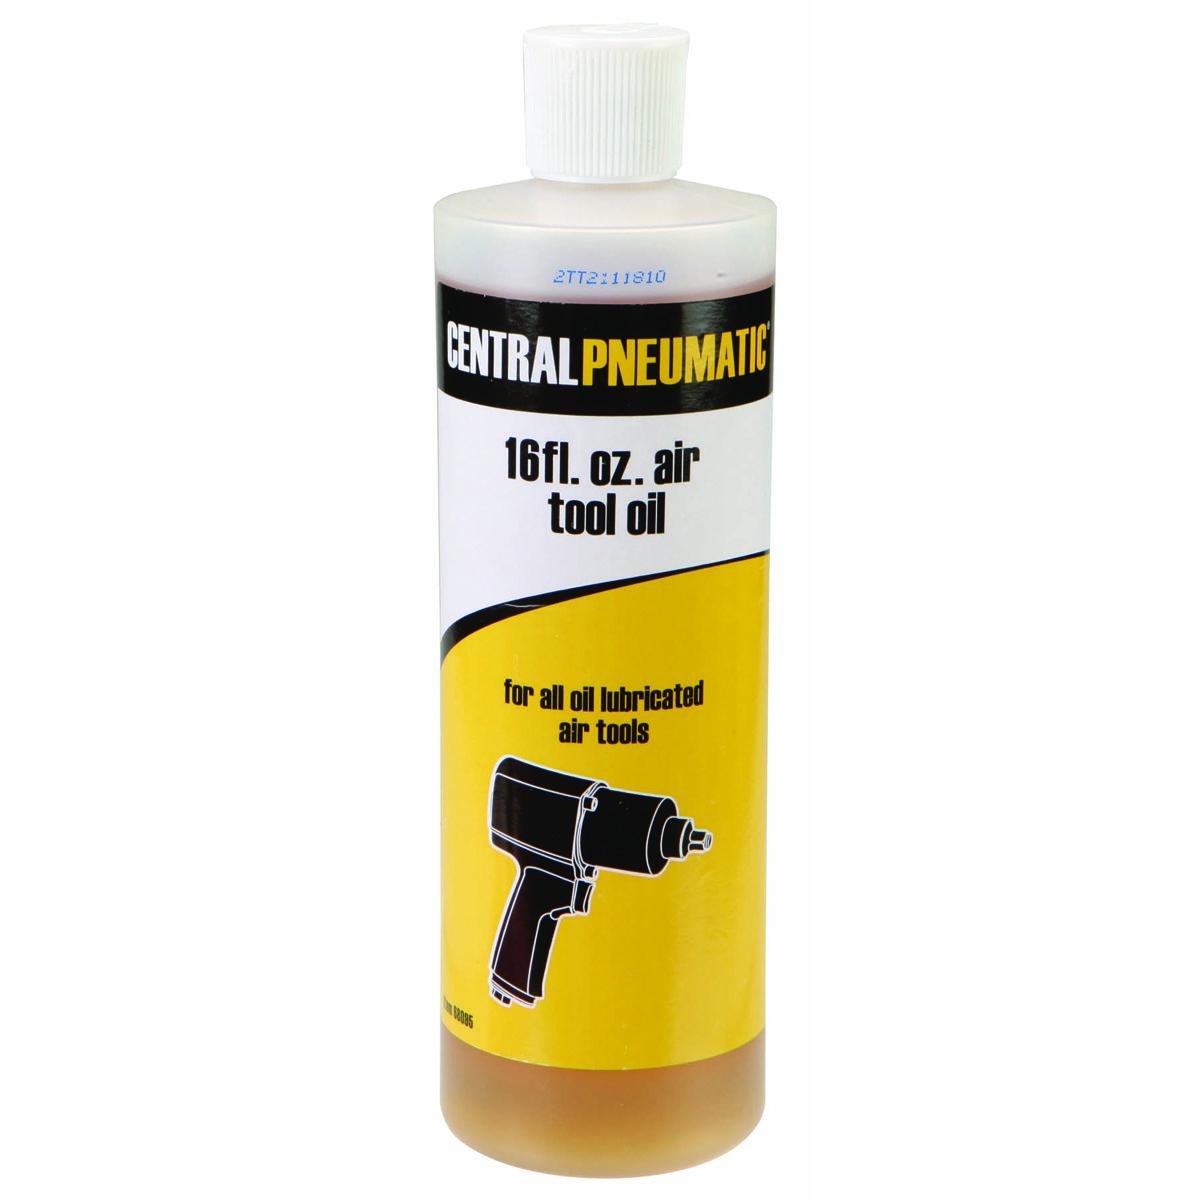 16 oz. Air Tool Oil Air tools, Tools, Harbor freight tools